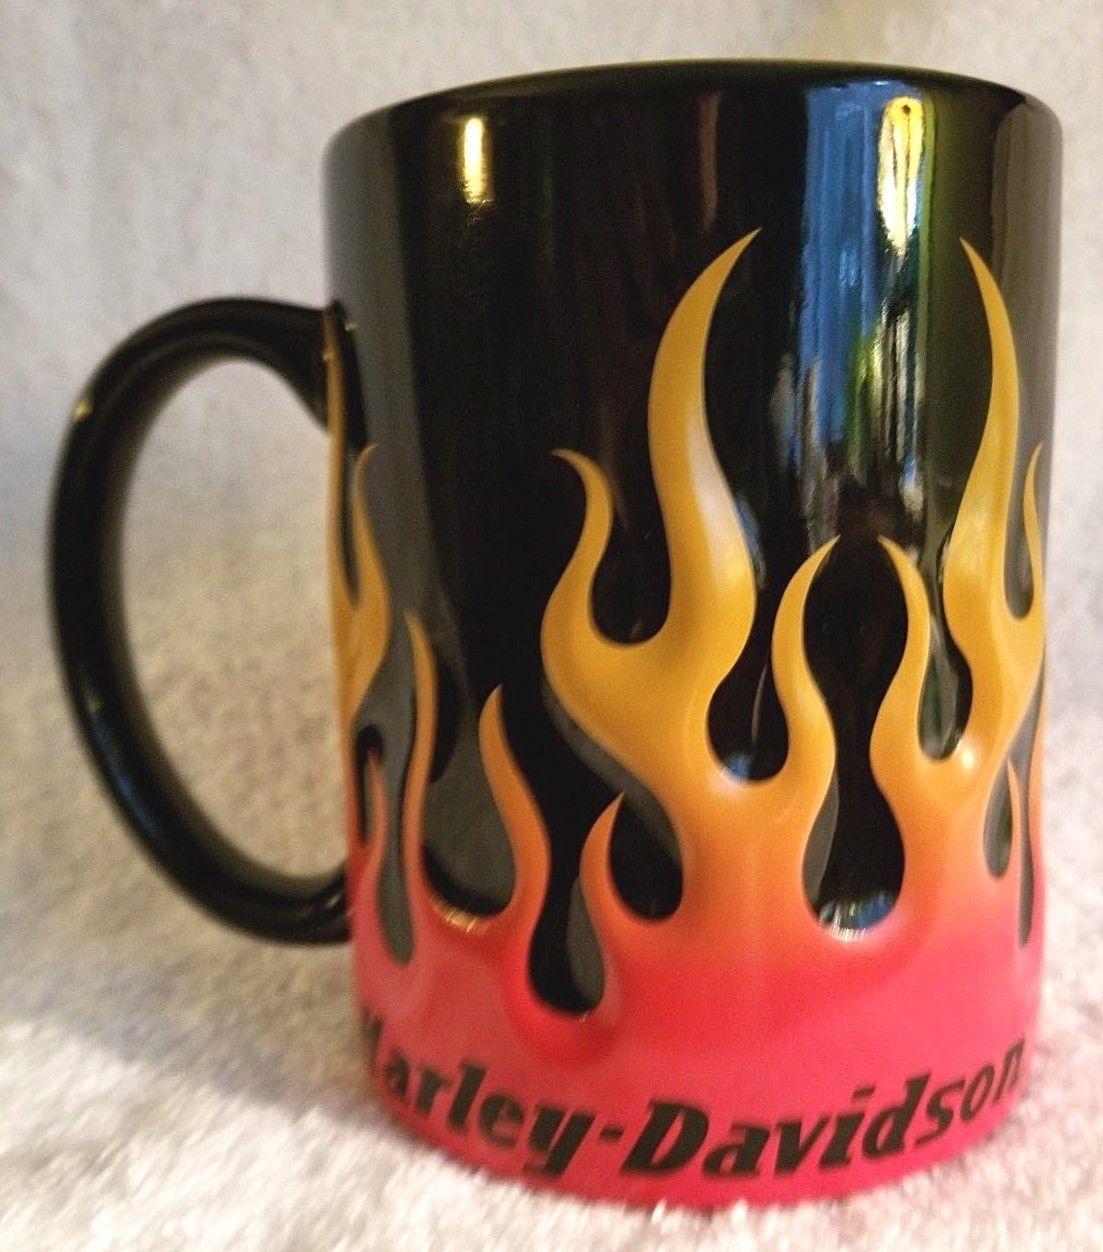 Harley Davidson Motorcycle Coffee Cup Mug Flames Oversize 2012